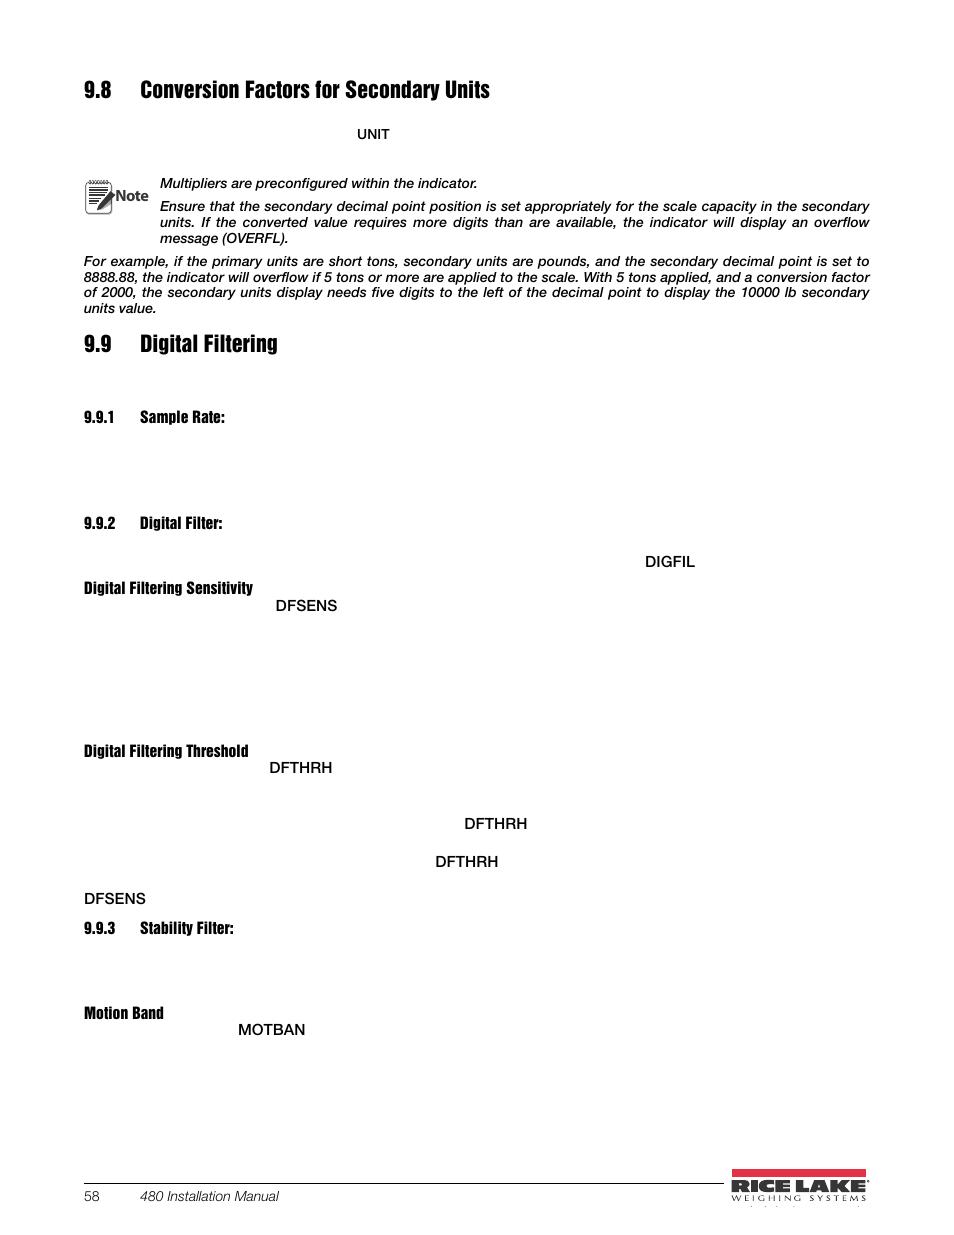 8 conversion factors for secondary units 9 digital filtering 1 rh manualsdir com user manual sample for system user manual sample for system